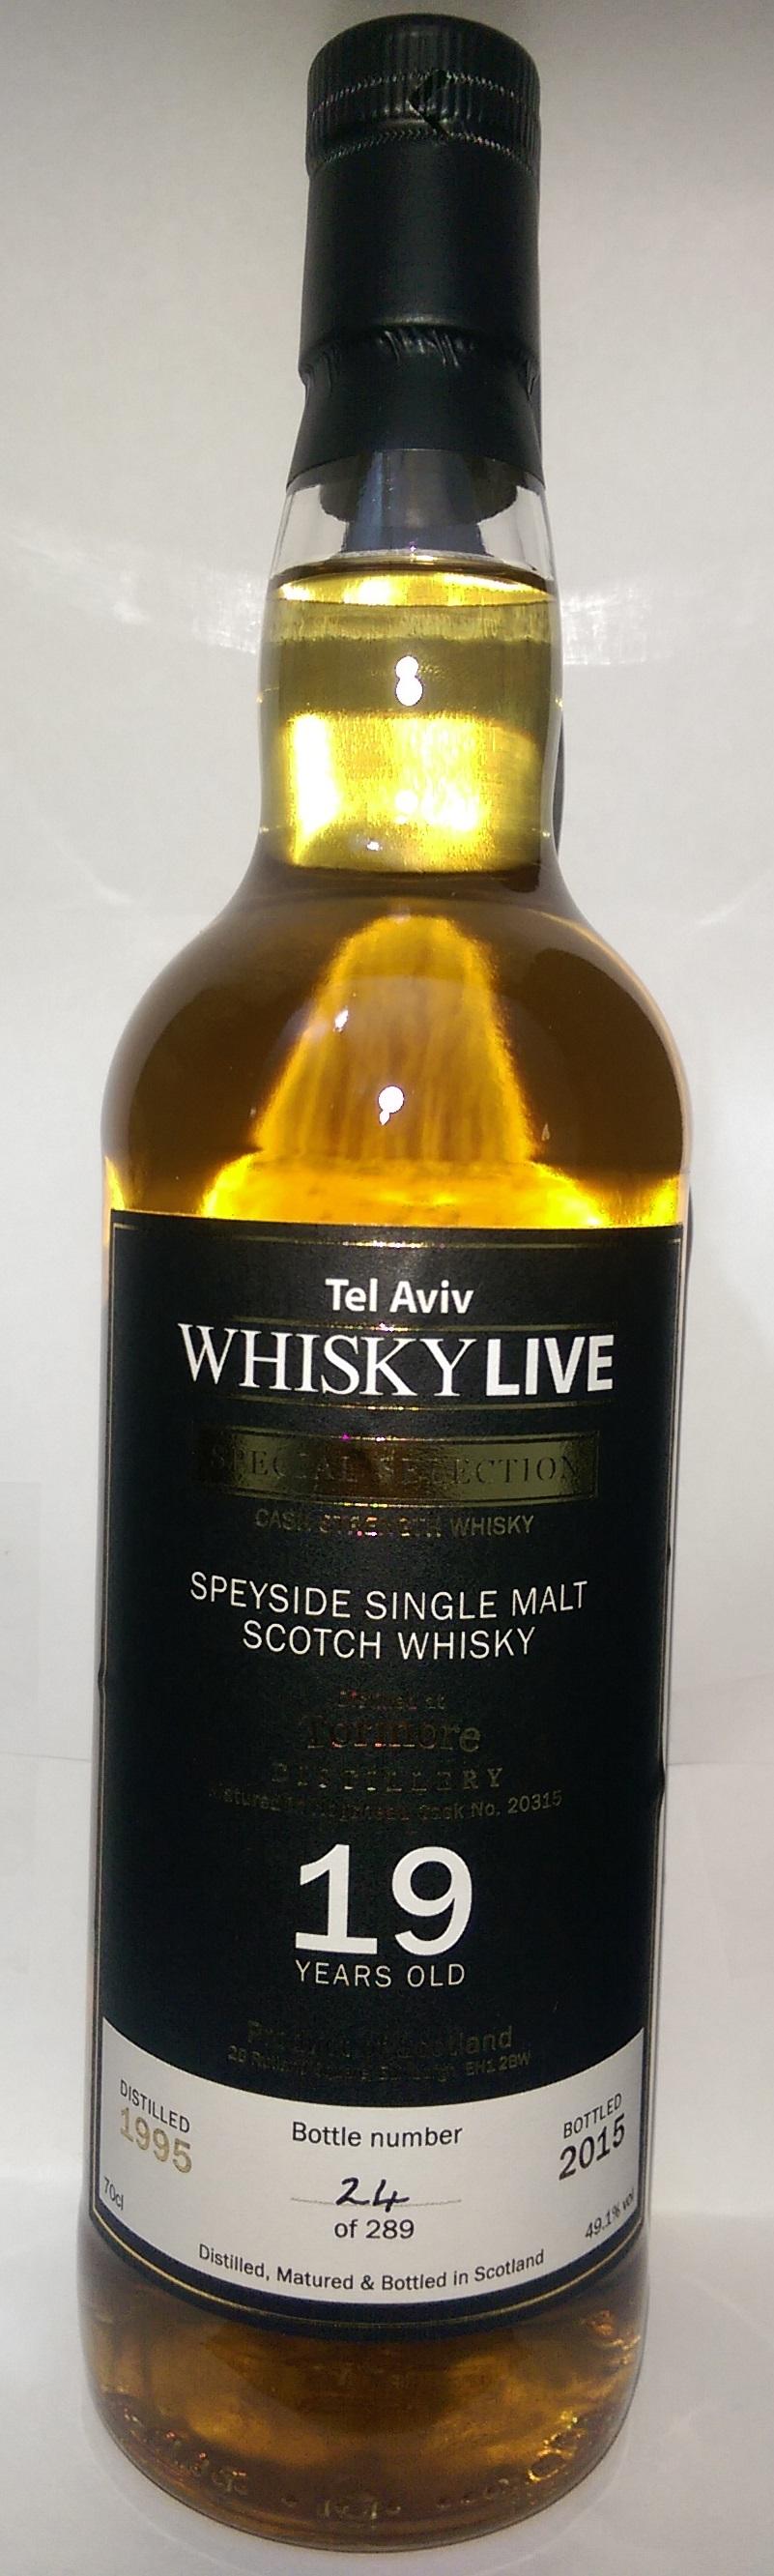 Whisky Live Tel-Aviv Tormore 19 y.o